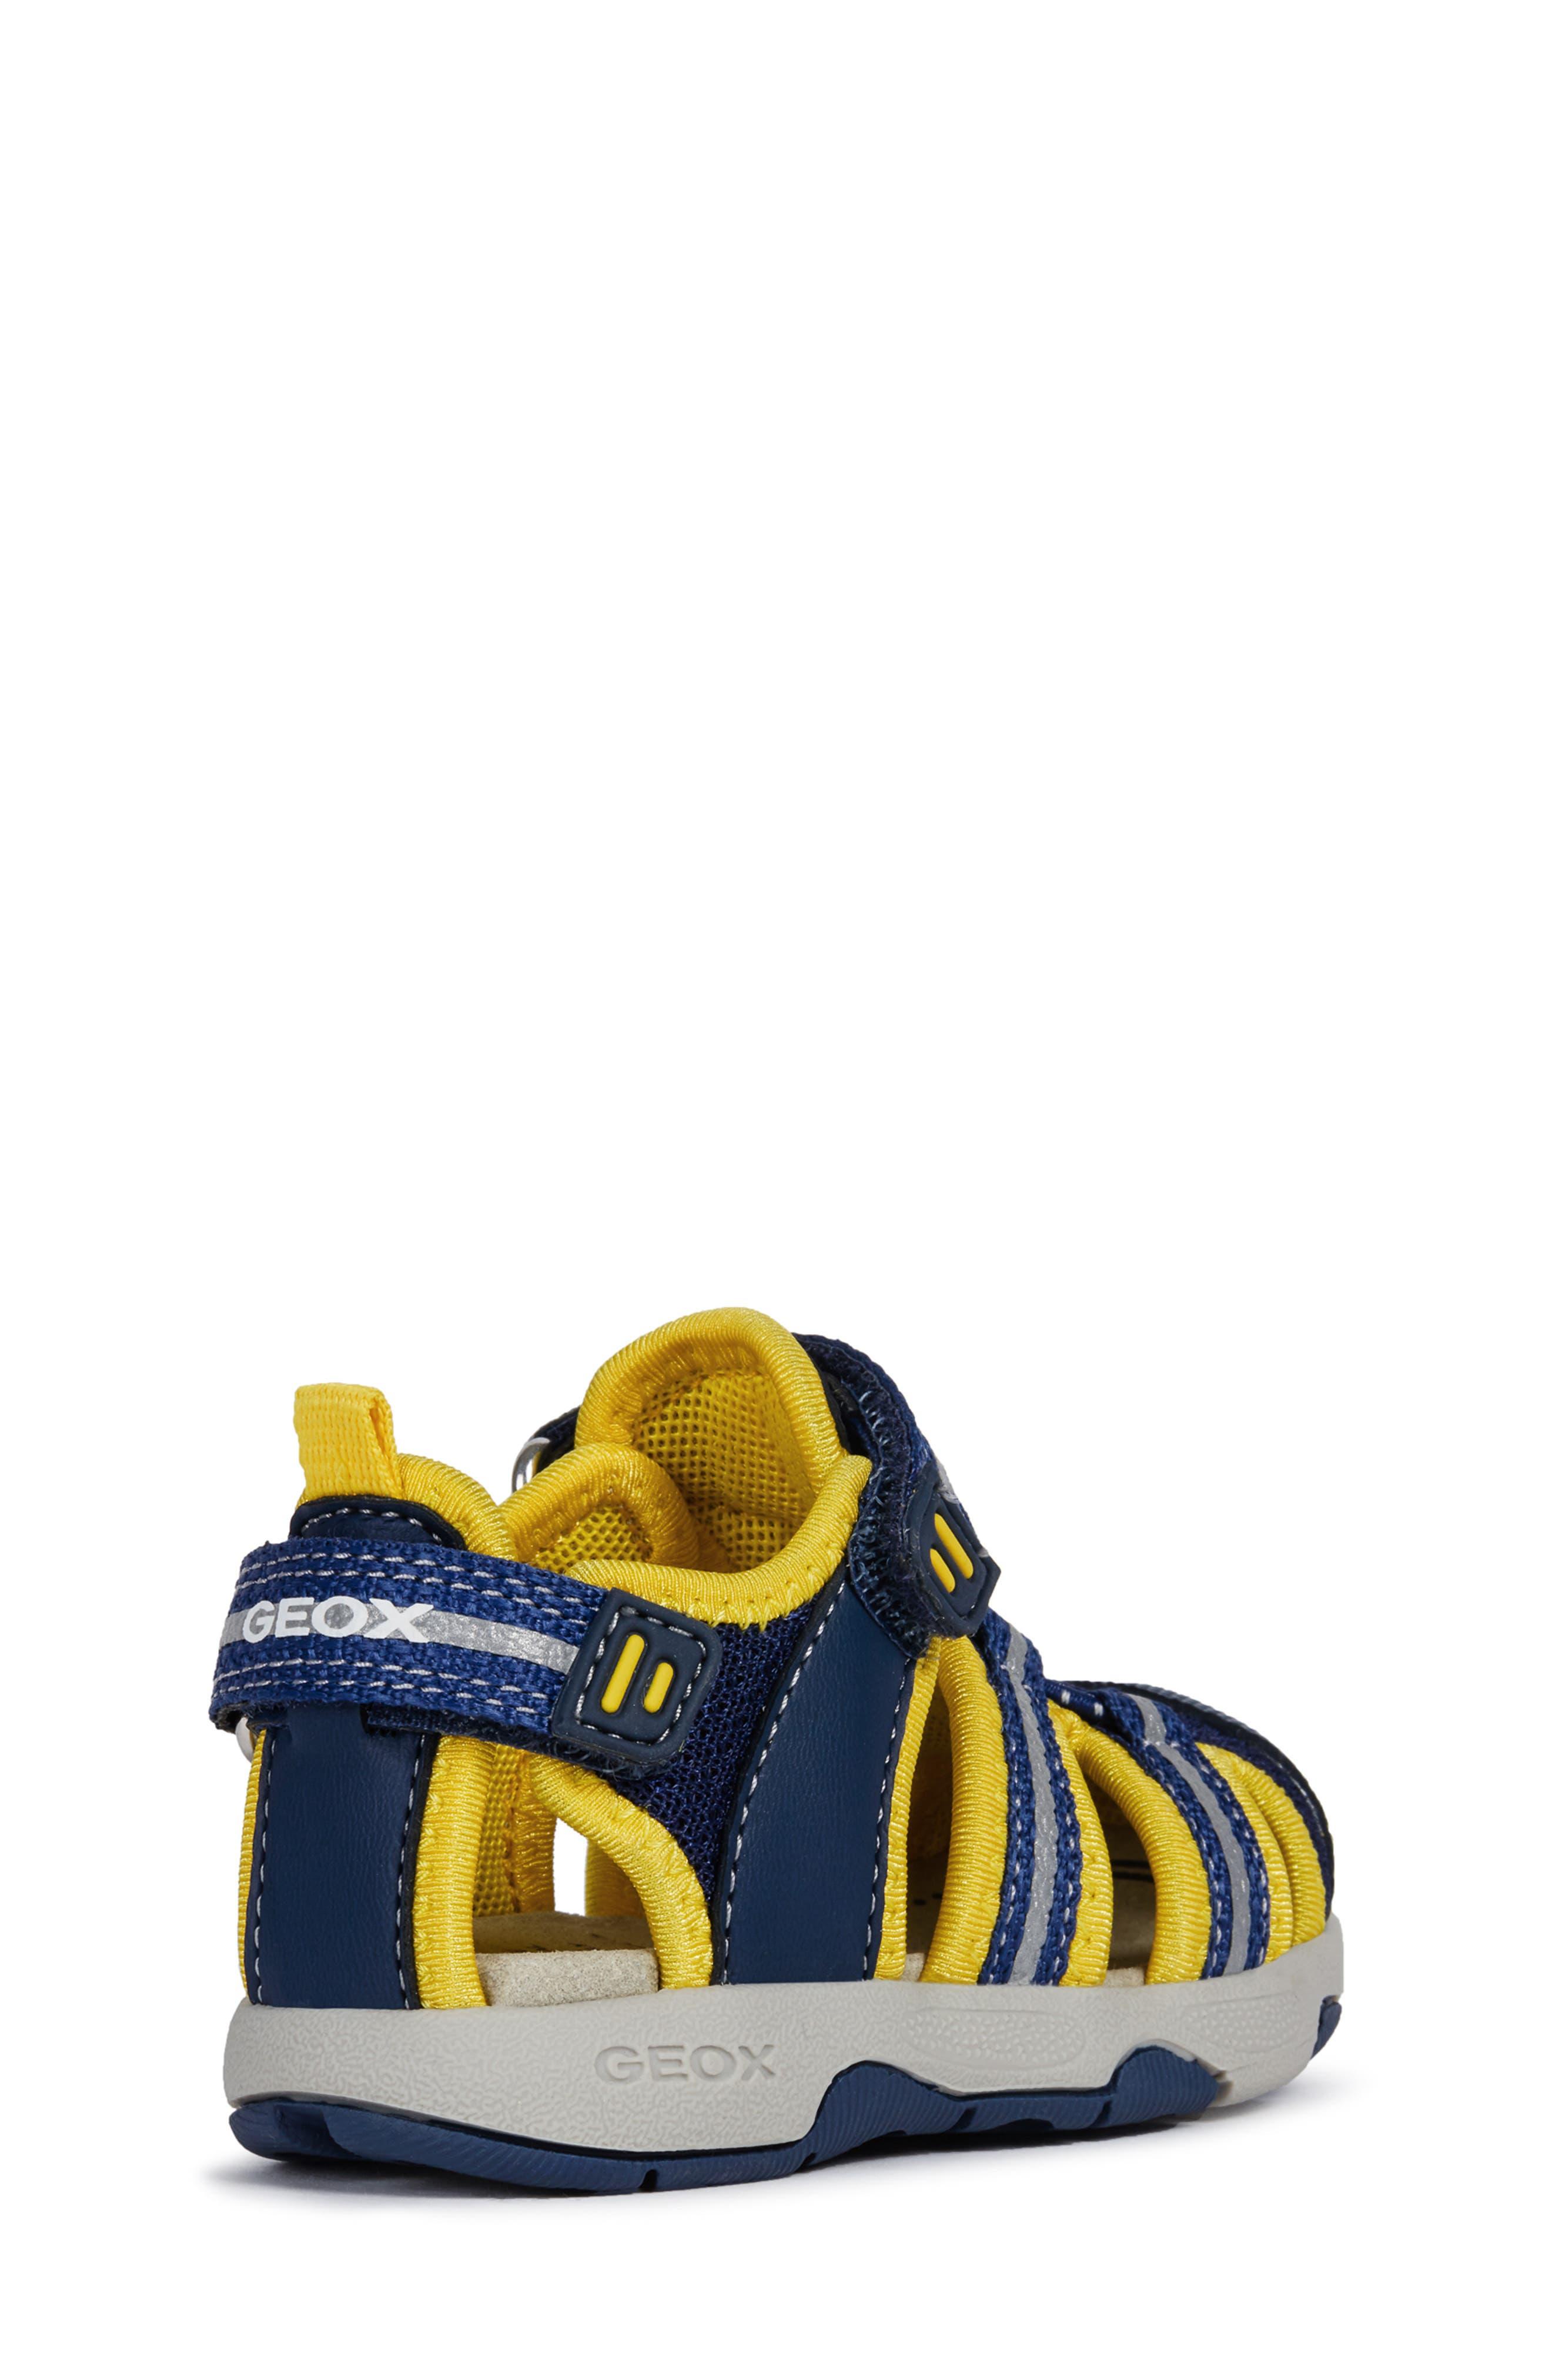 Multy Water Friendly Sandal,                             Alternate thumbnail 7, color,                             NAVY/ YELLOW